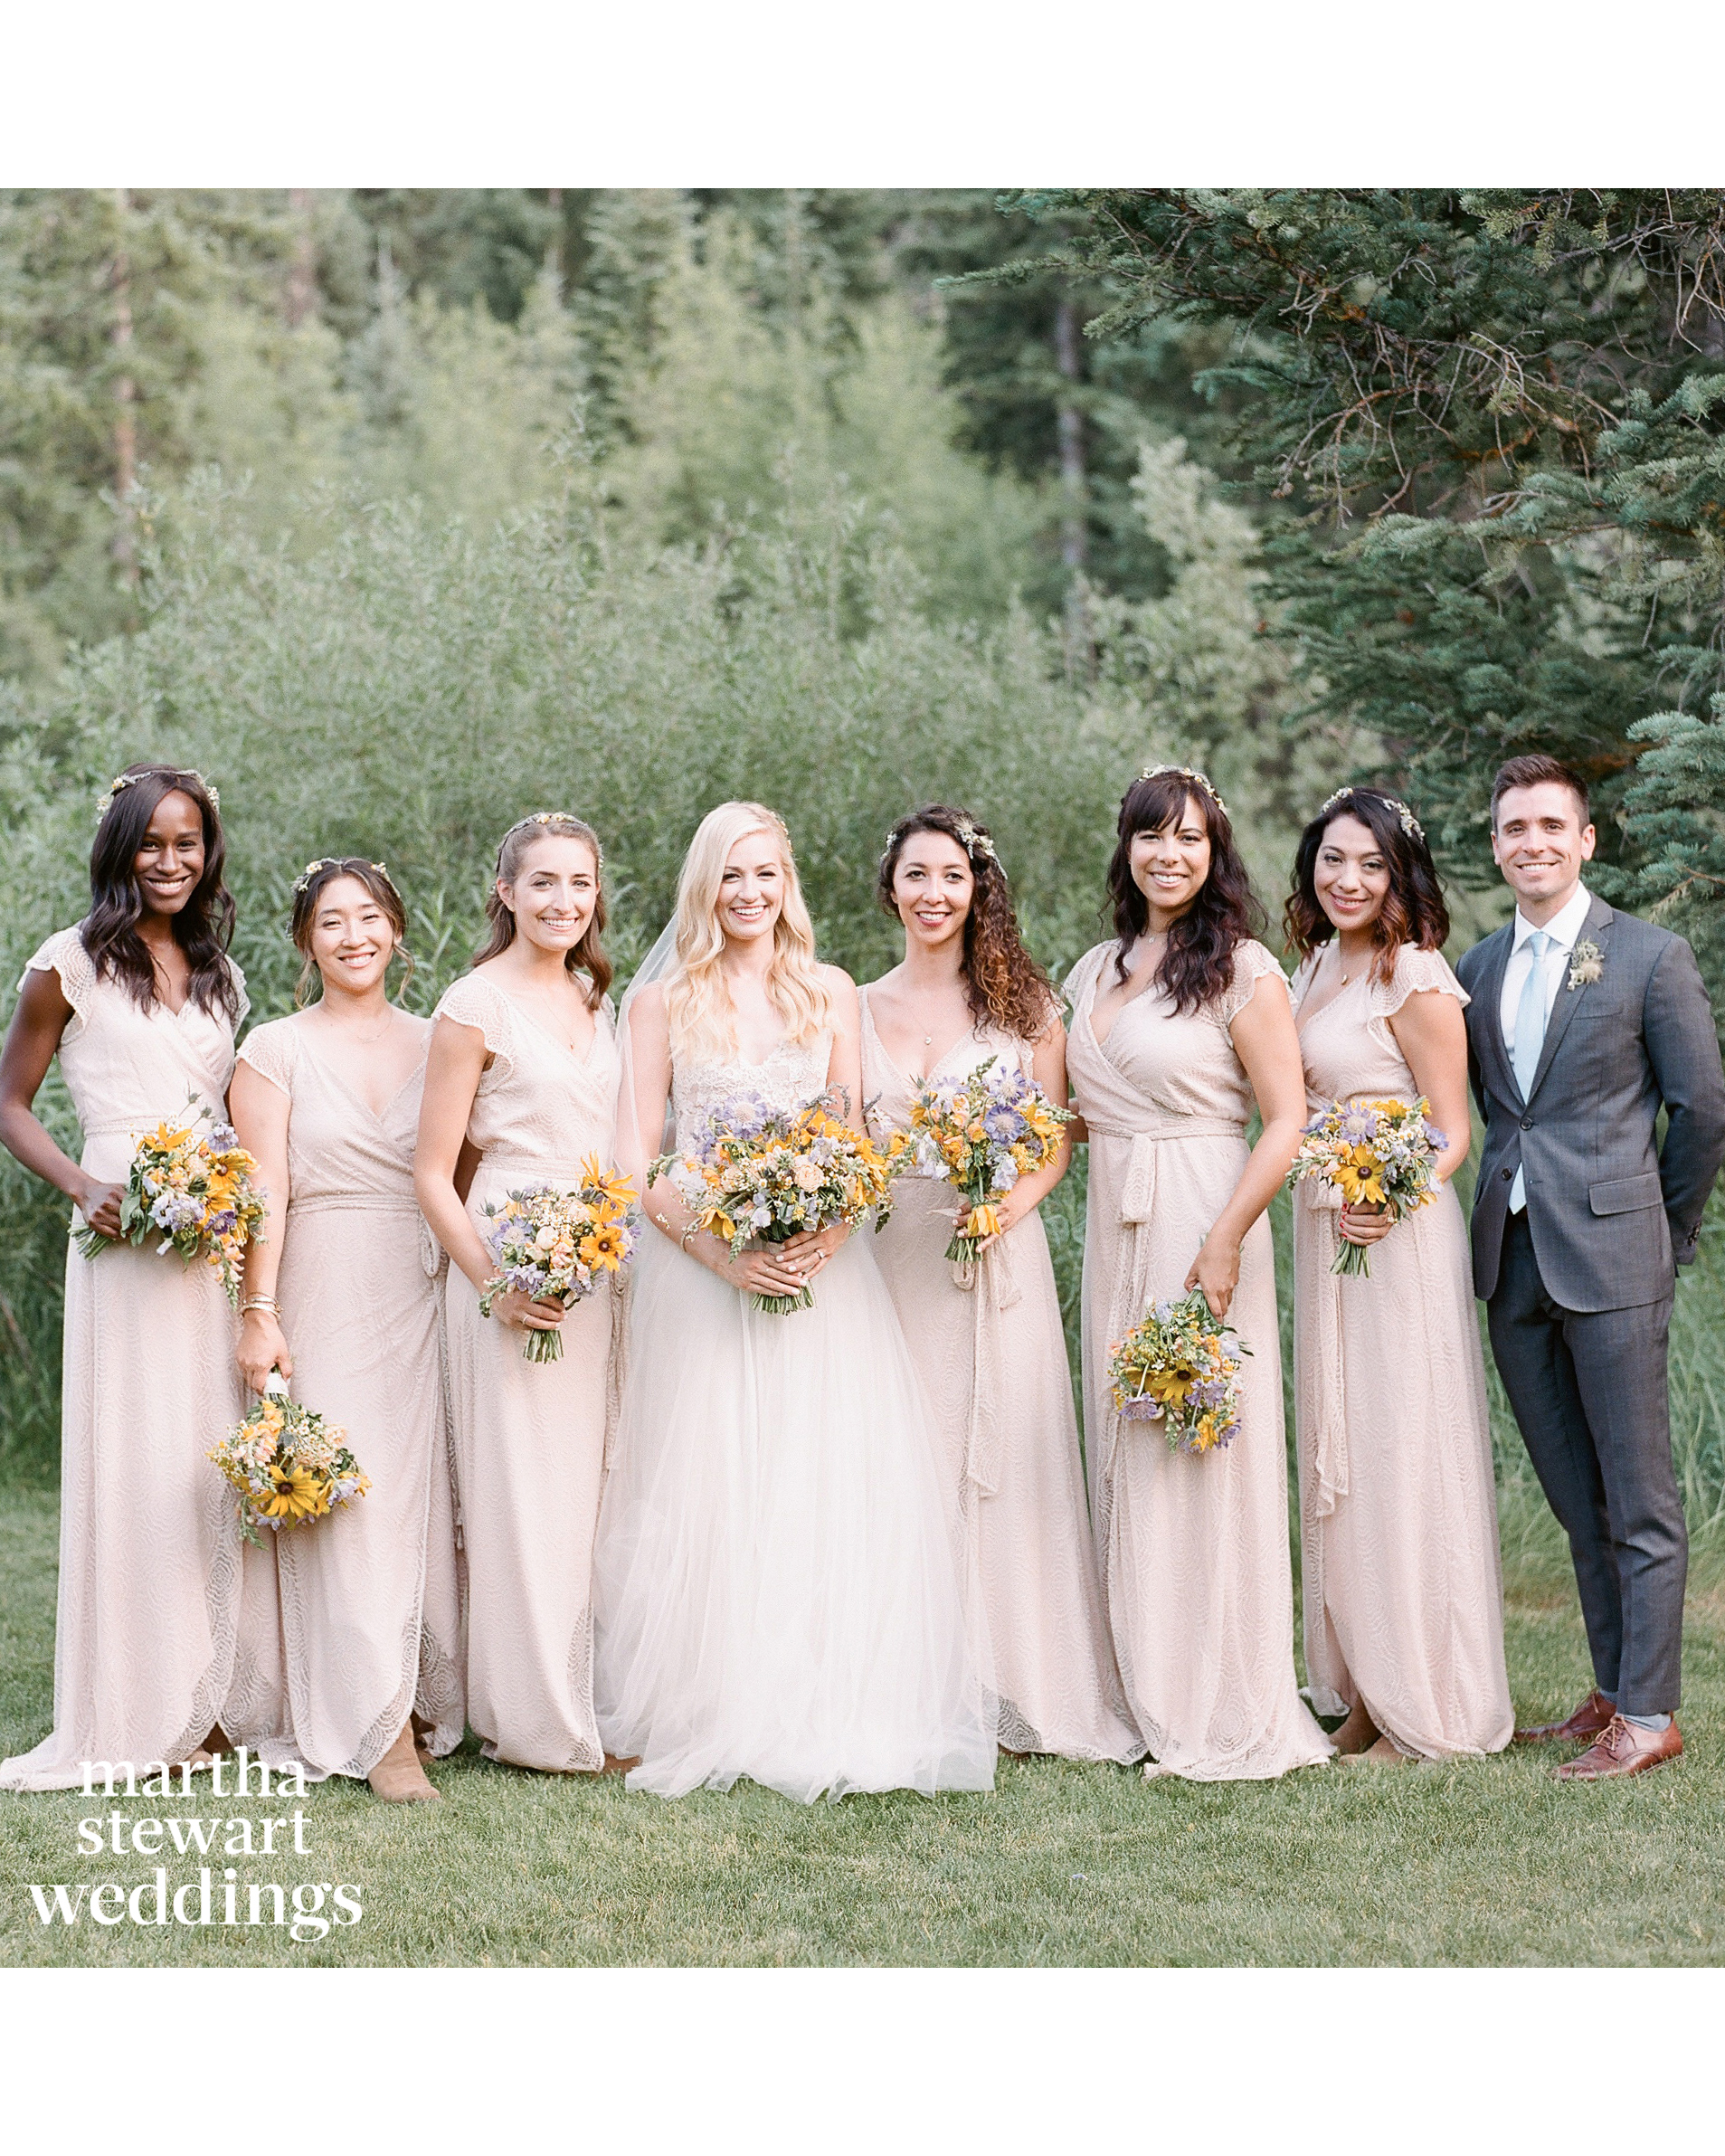 beth behrs michael gladis wedding bridal party sylvie gil